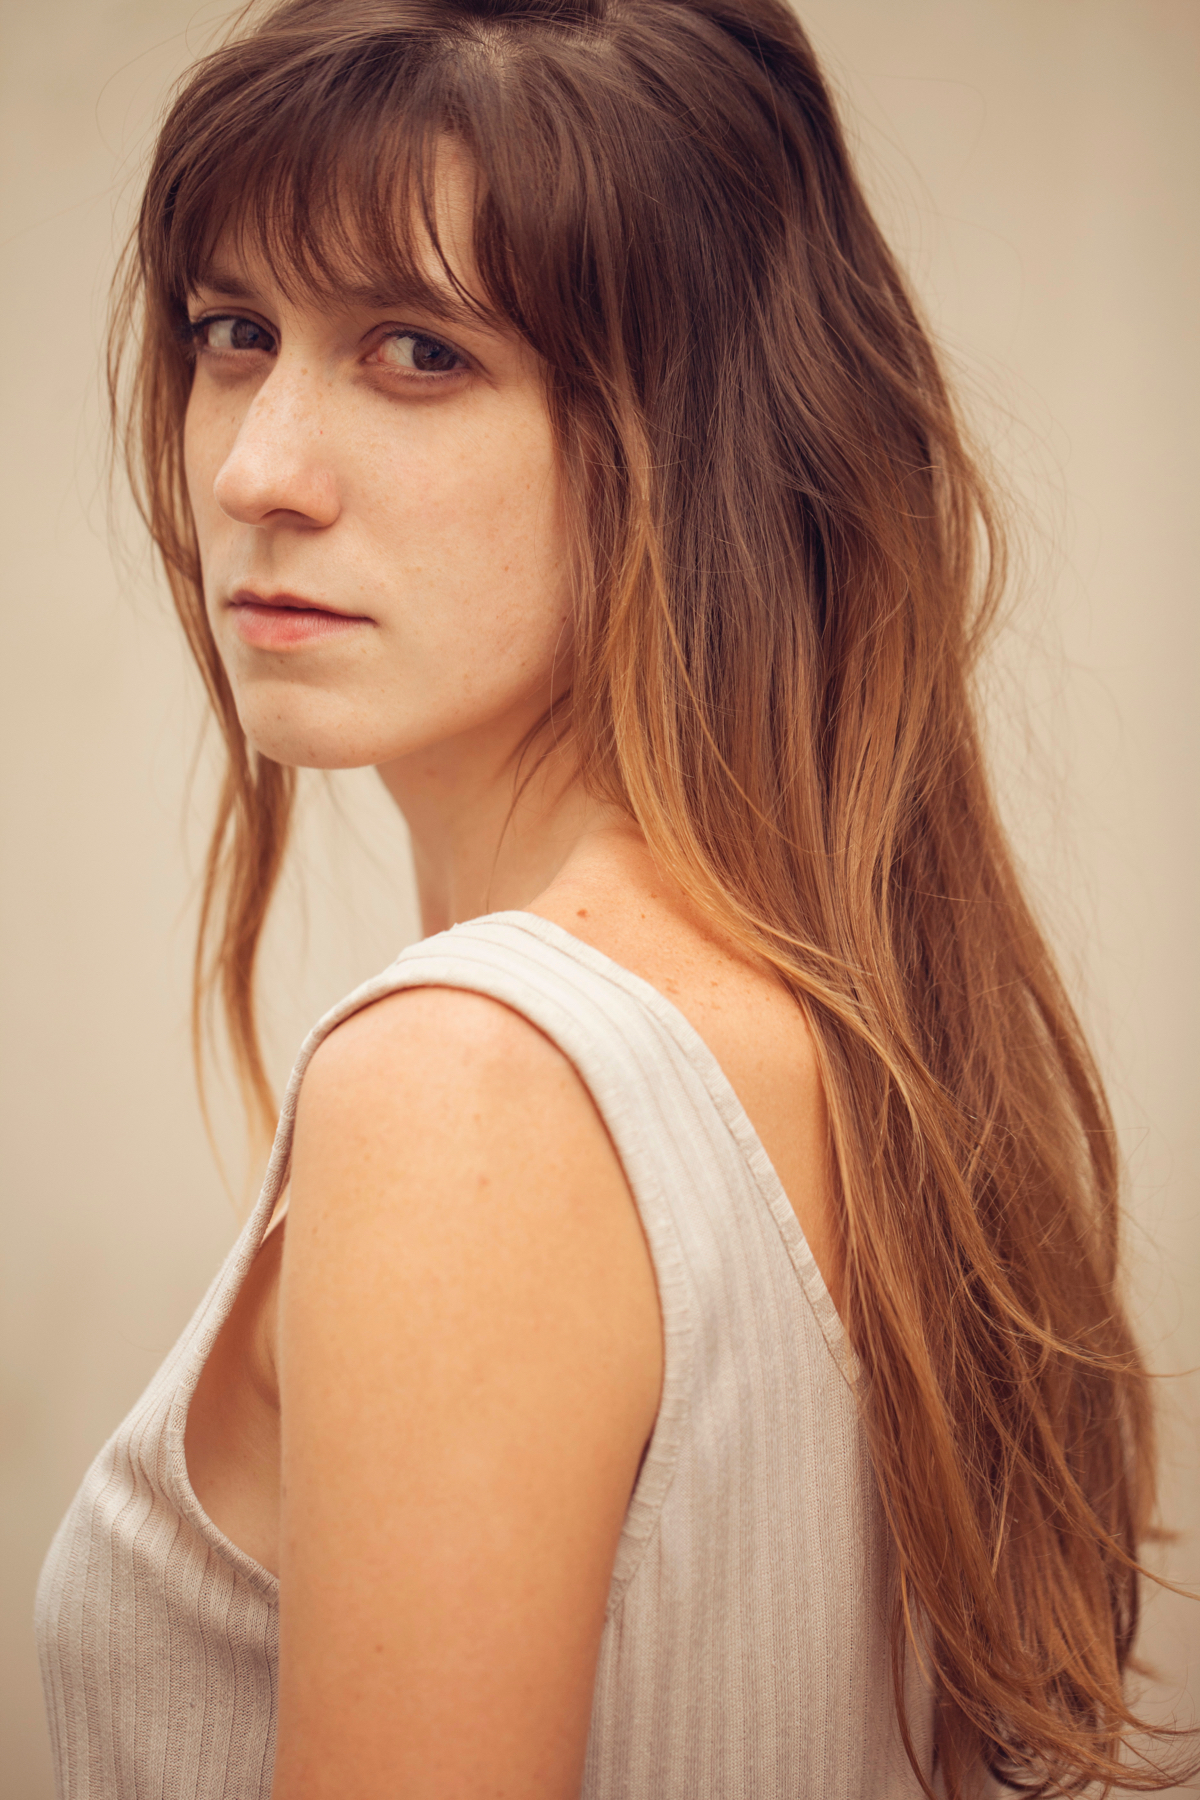 Dorine Bocquet